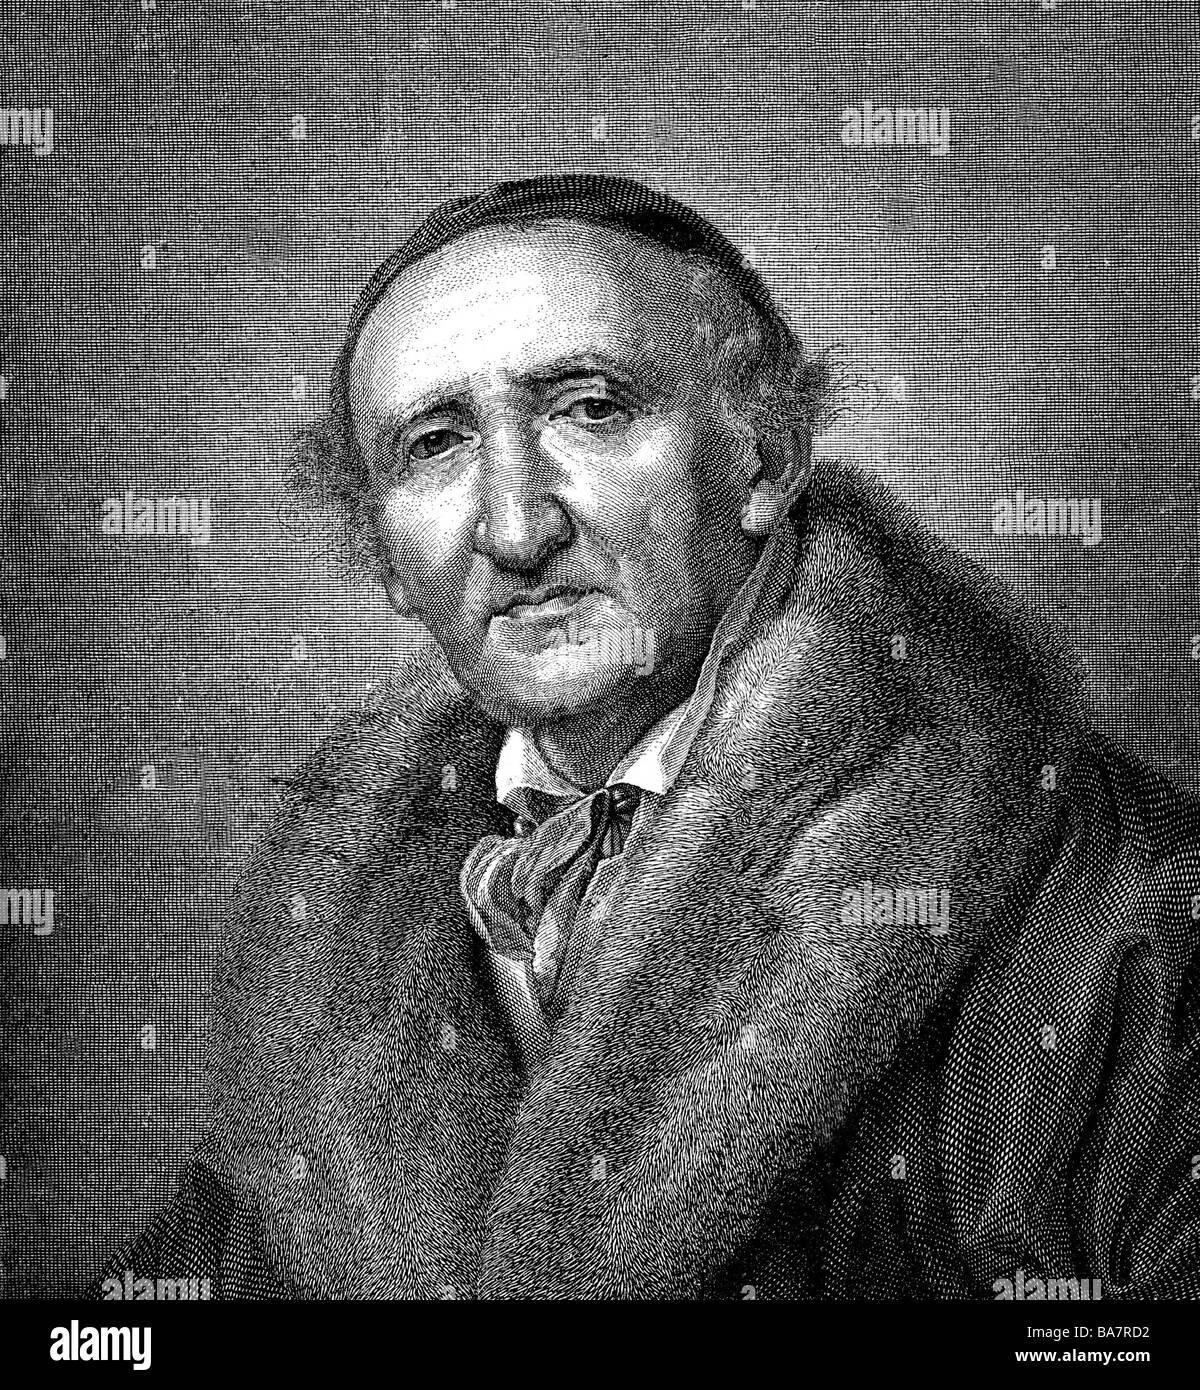 Schadow, Johann Gottfried, 20.5.1764 - 27.1.1850, German sculptor, portrait, wood engraving by H. Brei, after painting by Huebner, Stock Photo